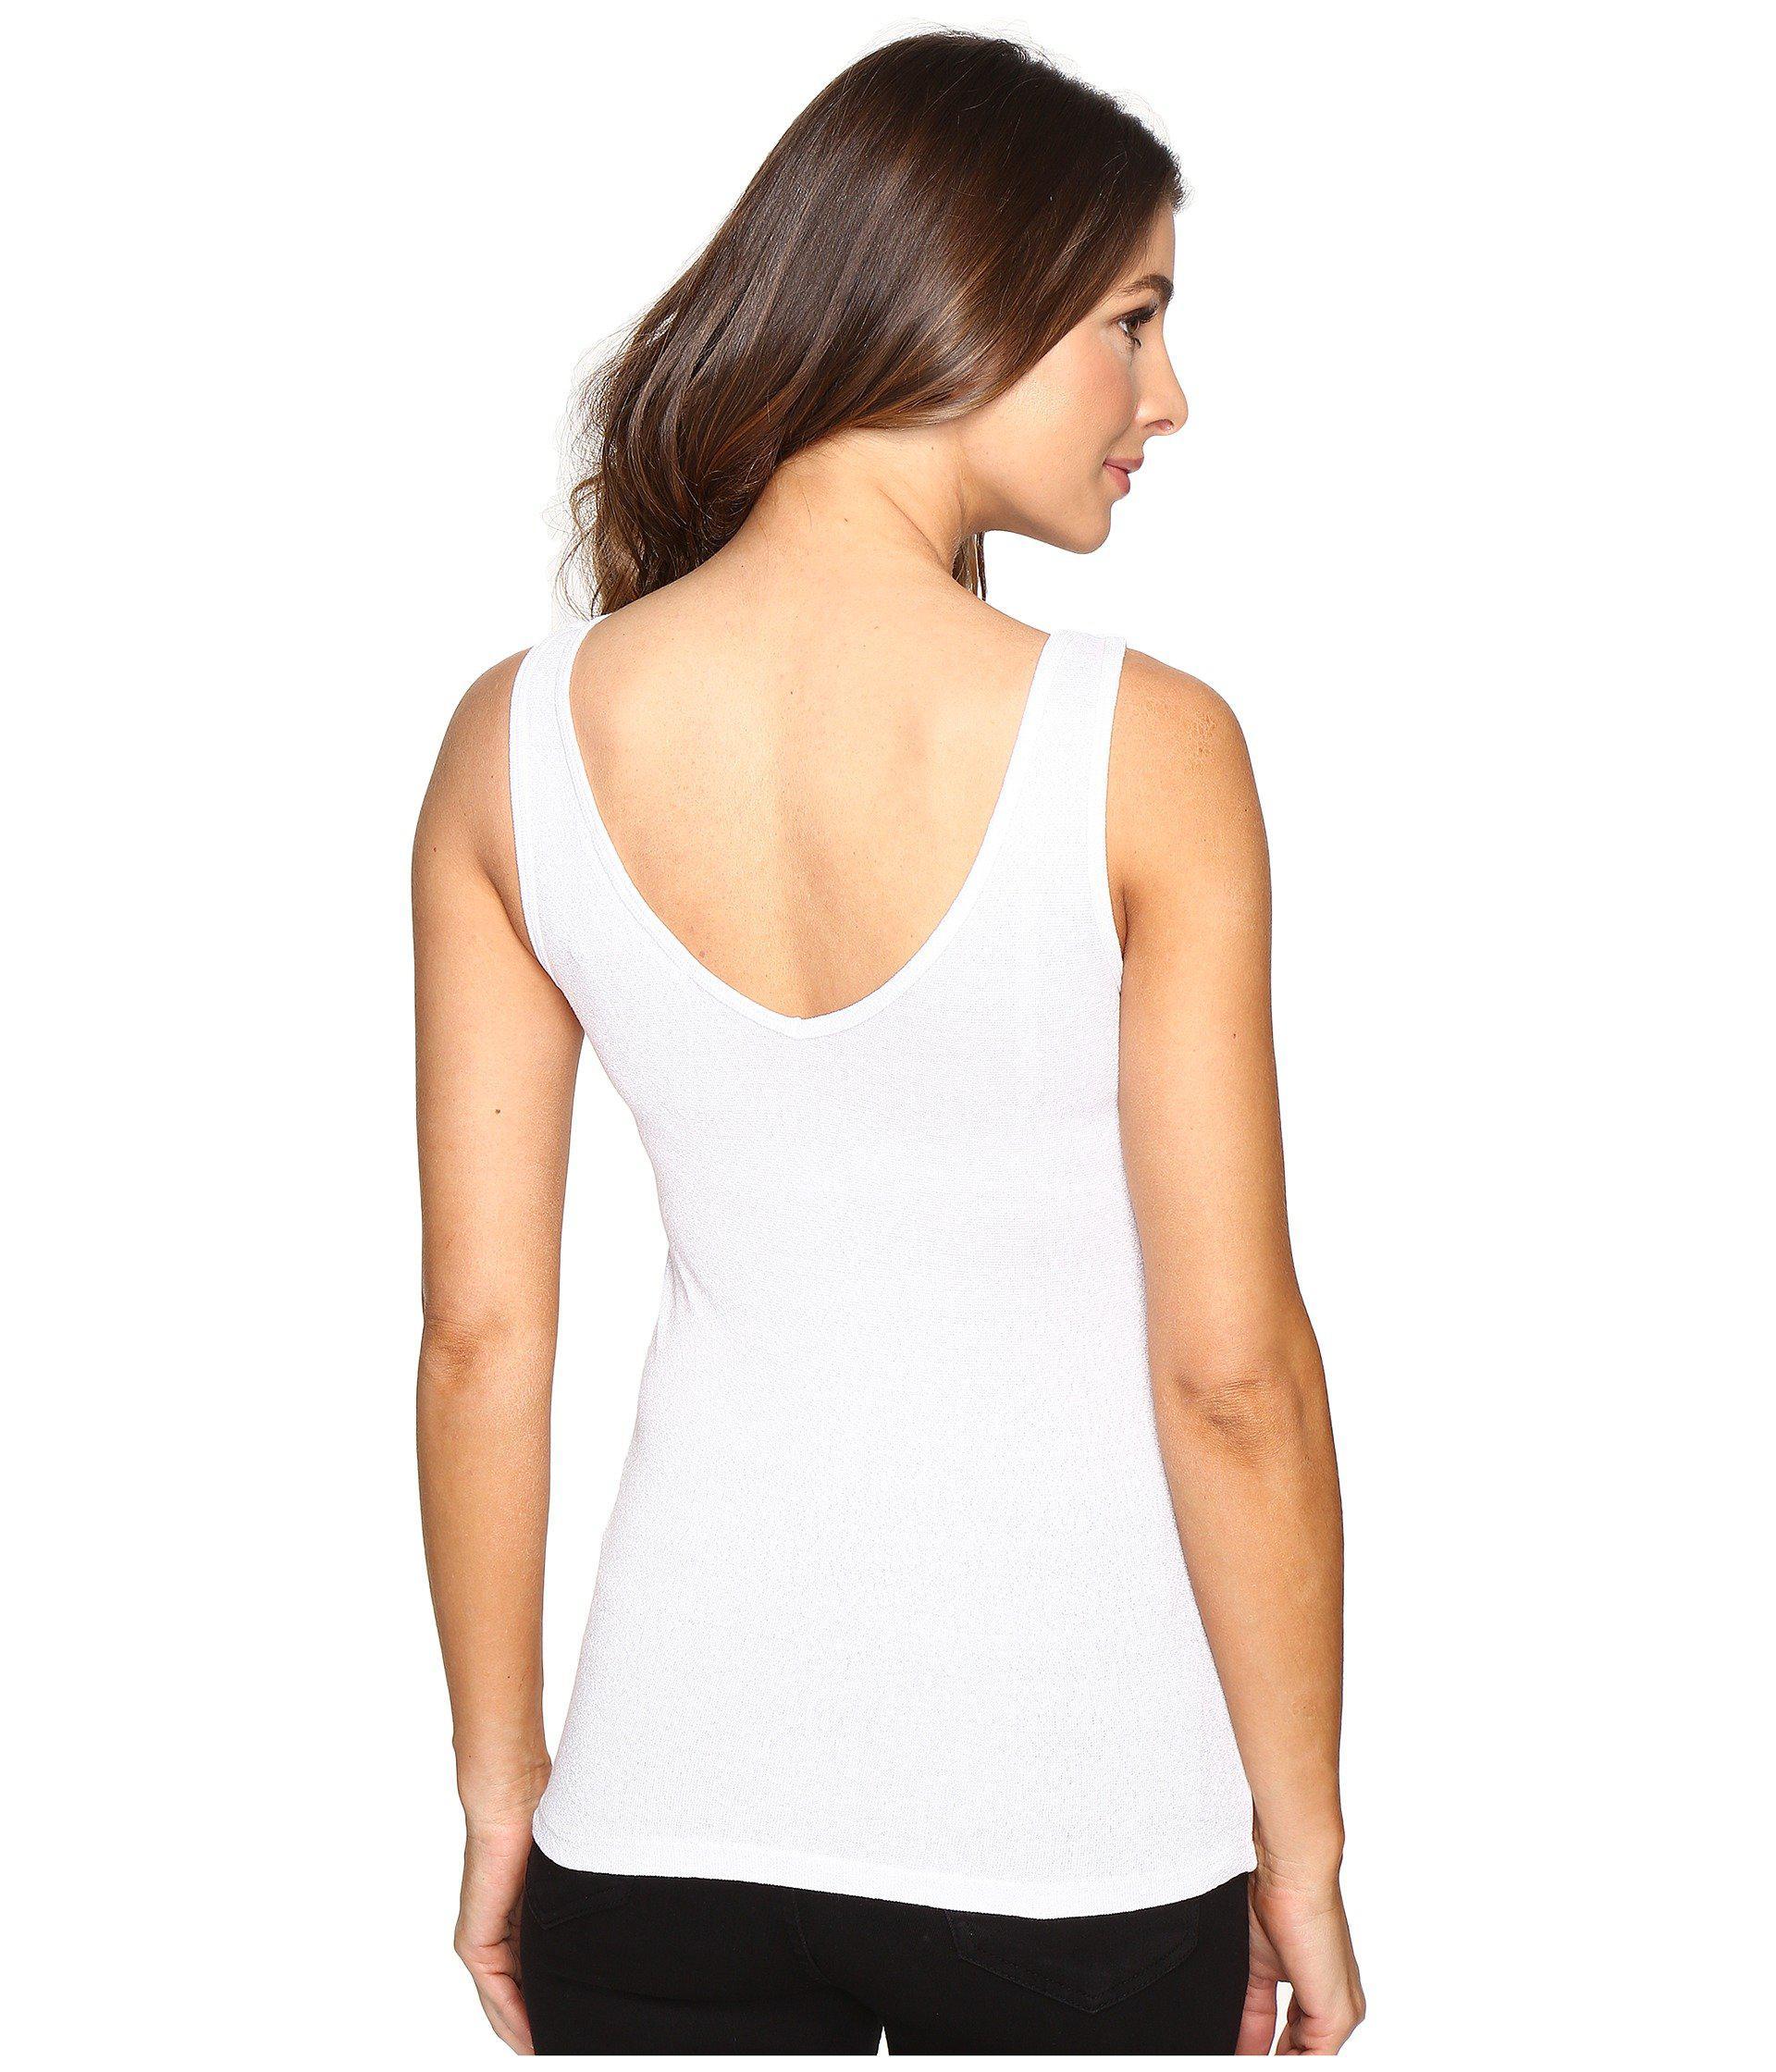 fcbe21a861ead ... White Shine Double Front V-neck Tank Top (black) Women s. View  fullscreen